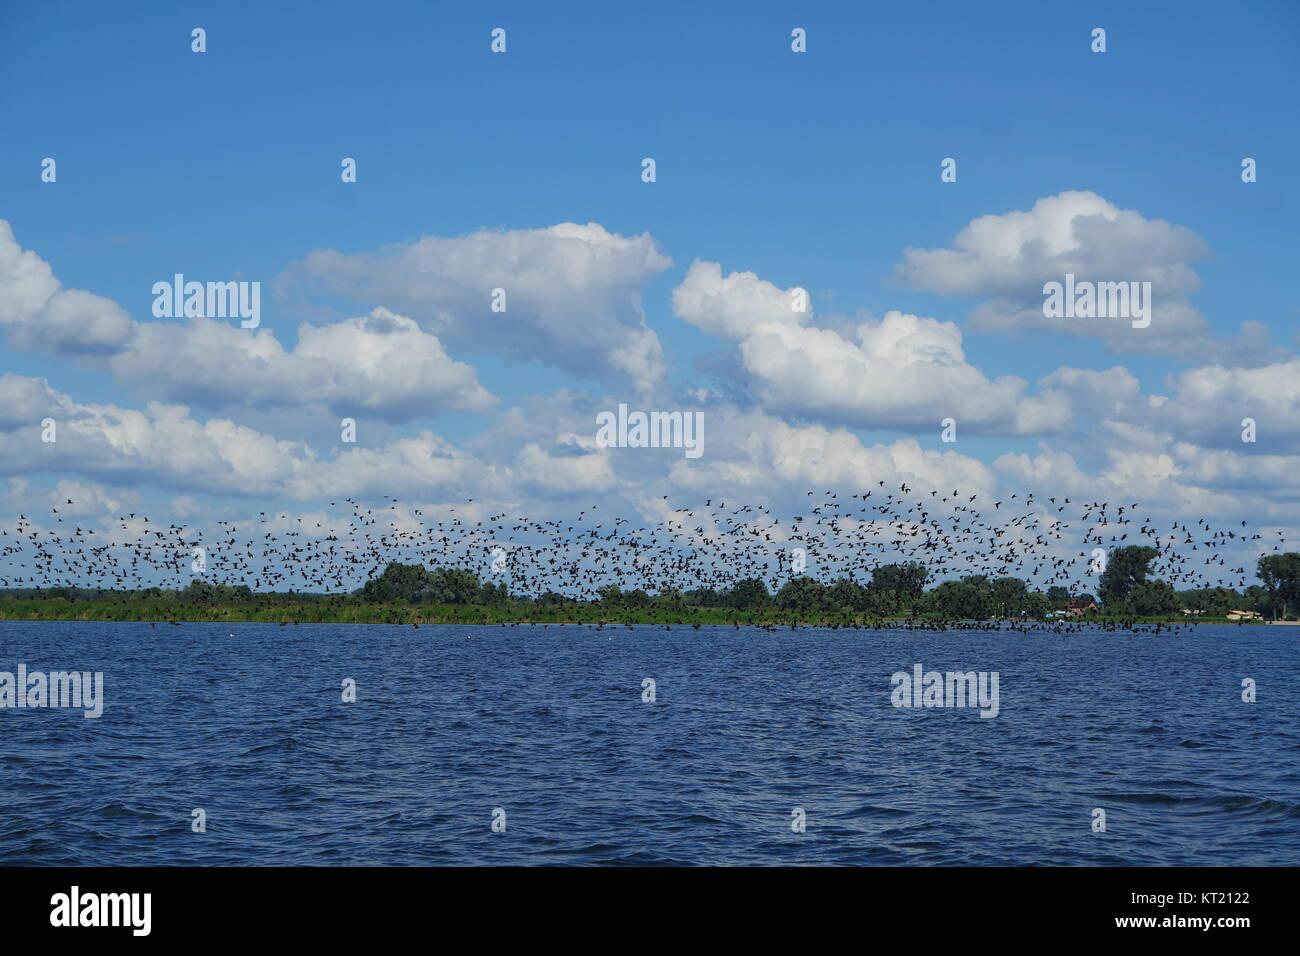 cormorants on the lake - Stock Image